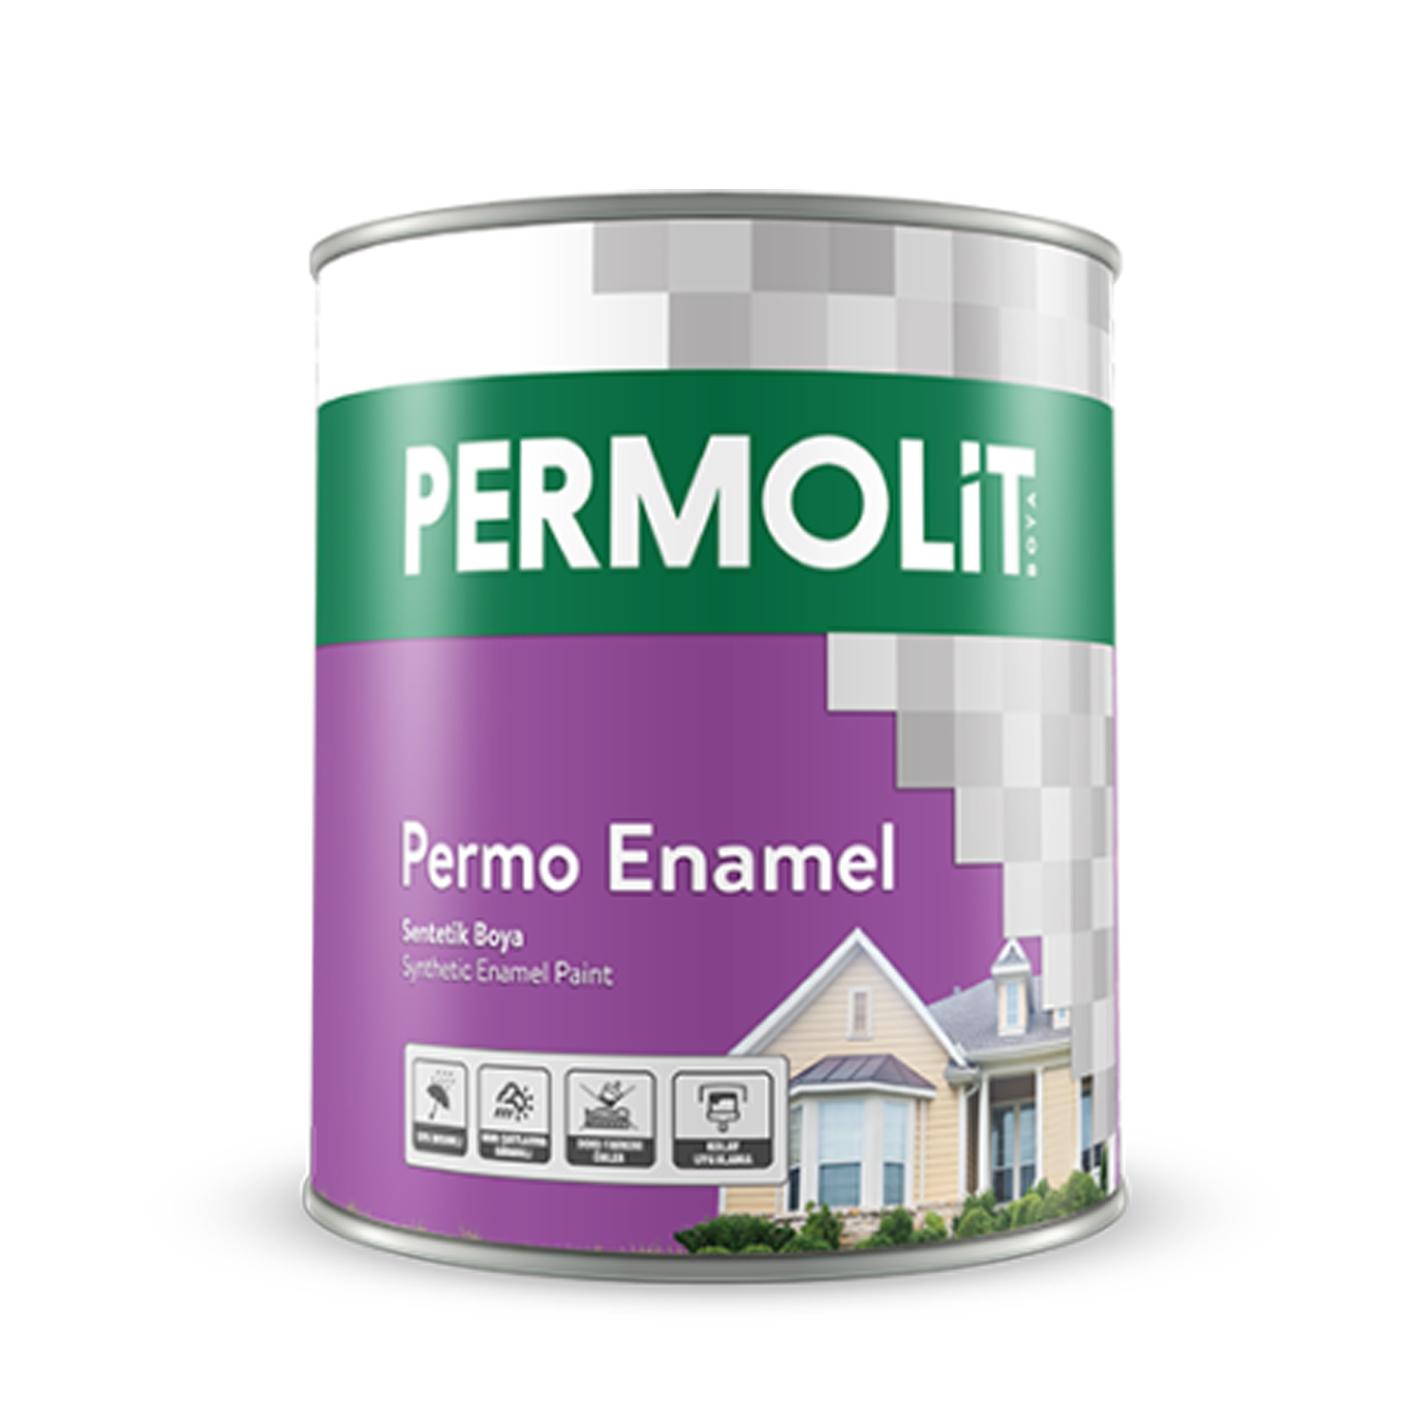 Permolit Permo Enamel Sentetik Lacivert 2.5Lt